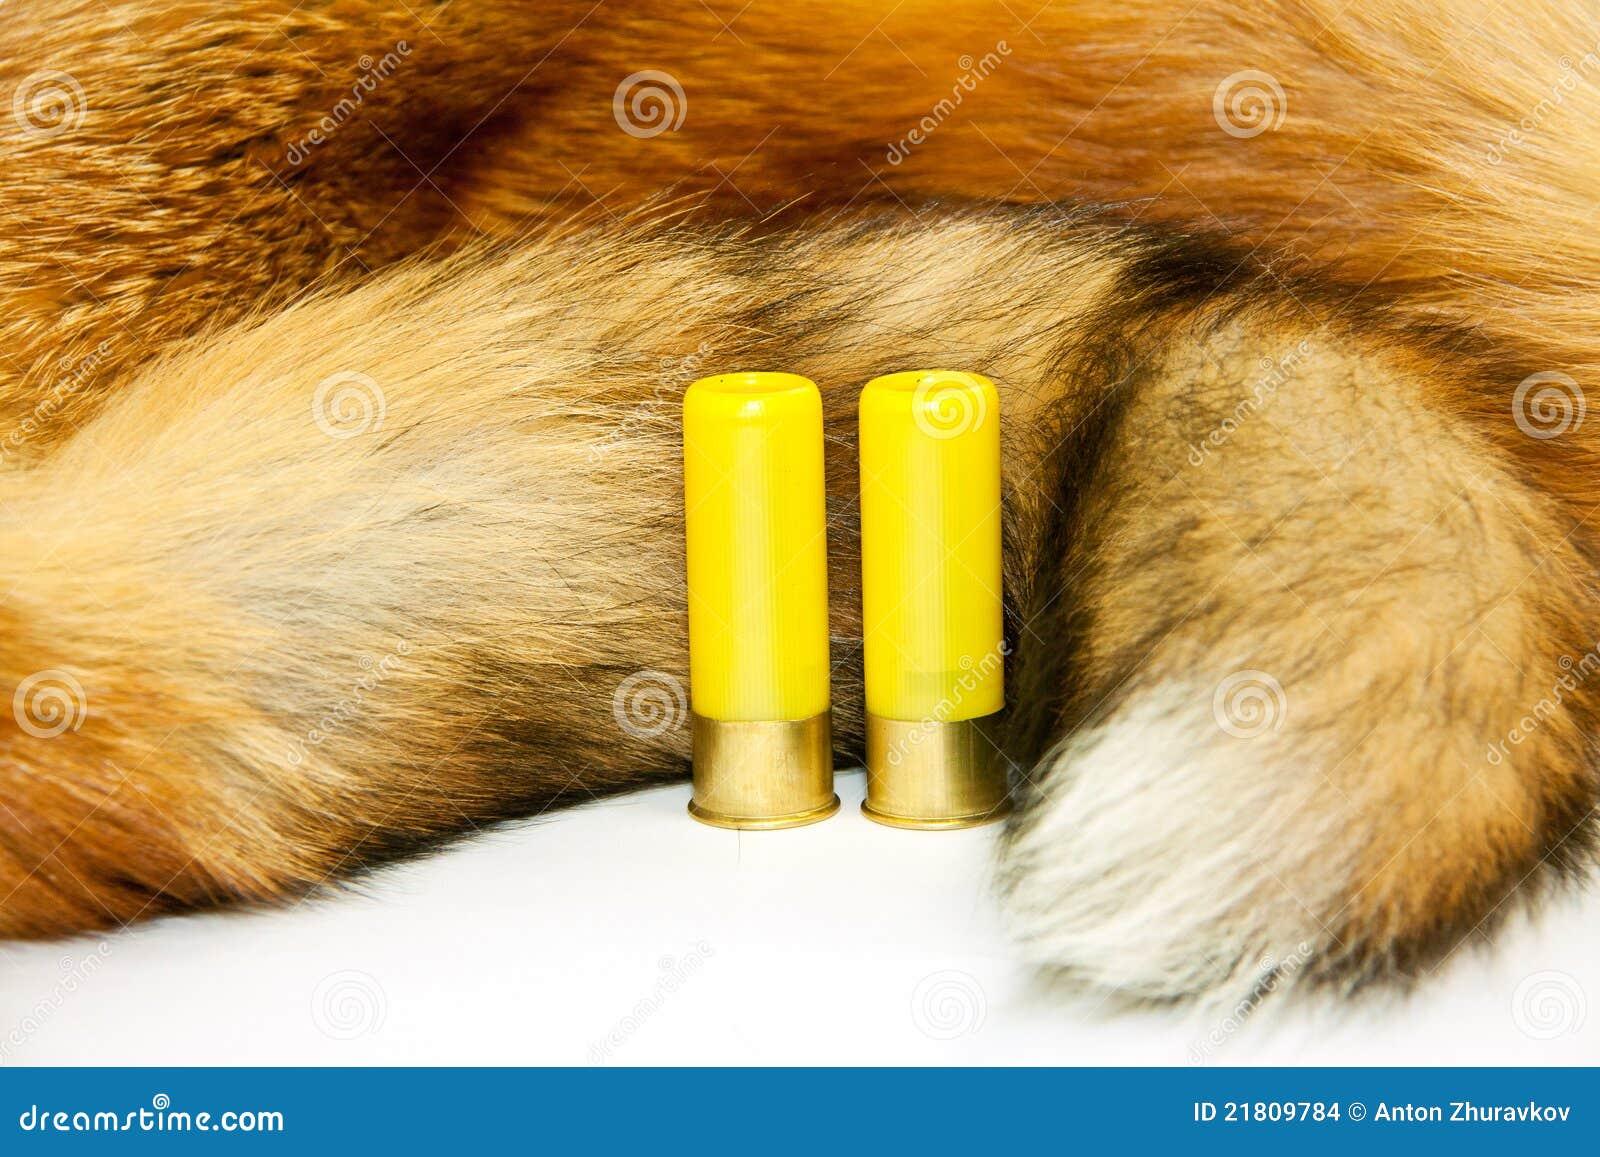 Cartridges on red fox fur